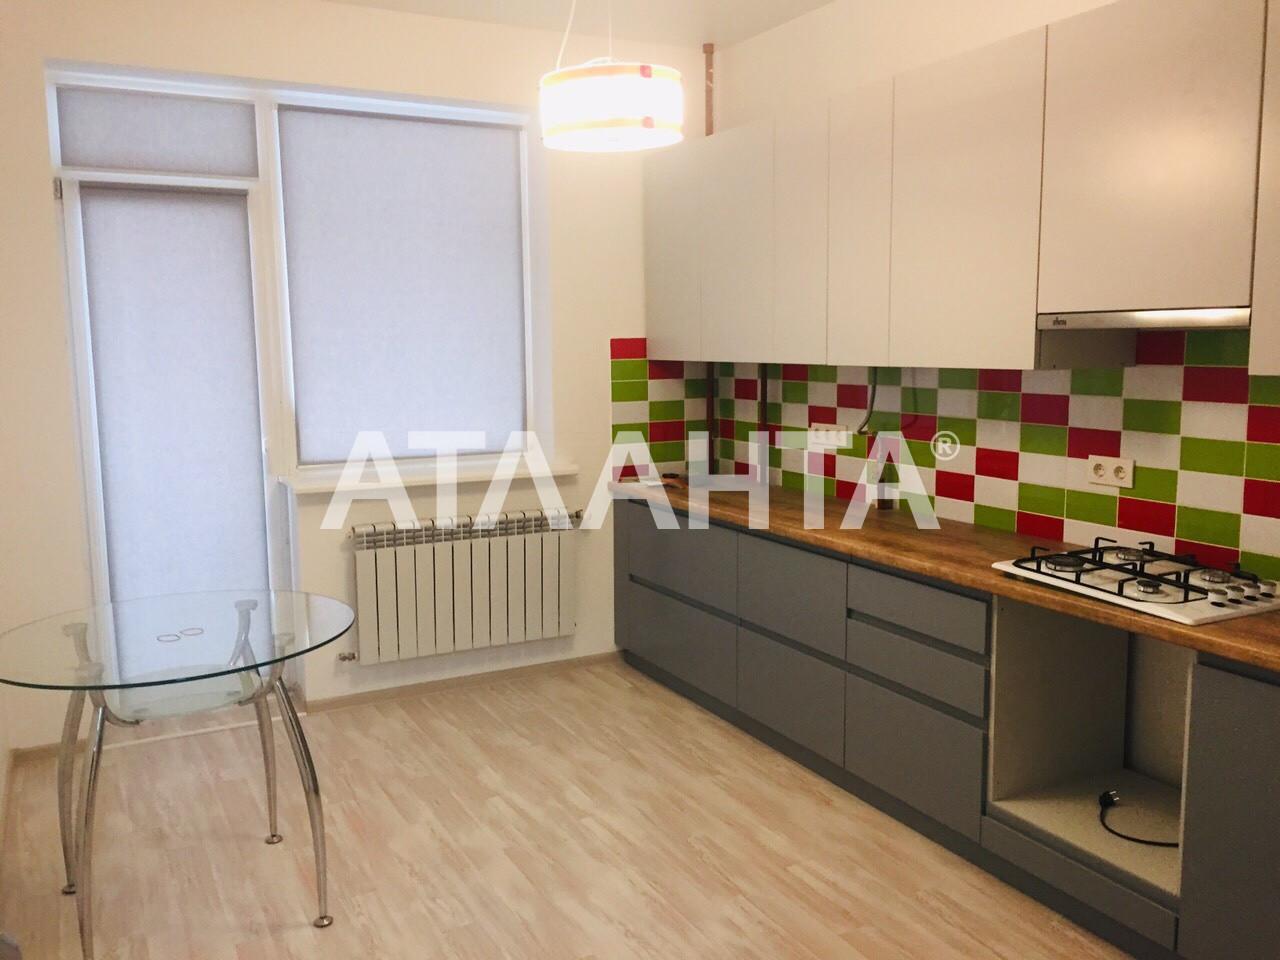 Продается 1-комнатная Квартира на ул. Валовня — 42 000 у.е. (фото №3)